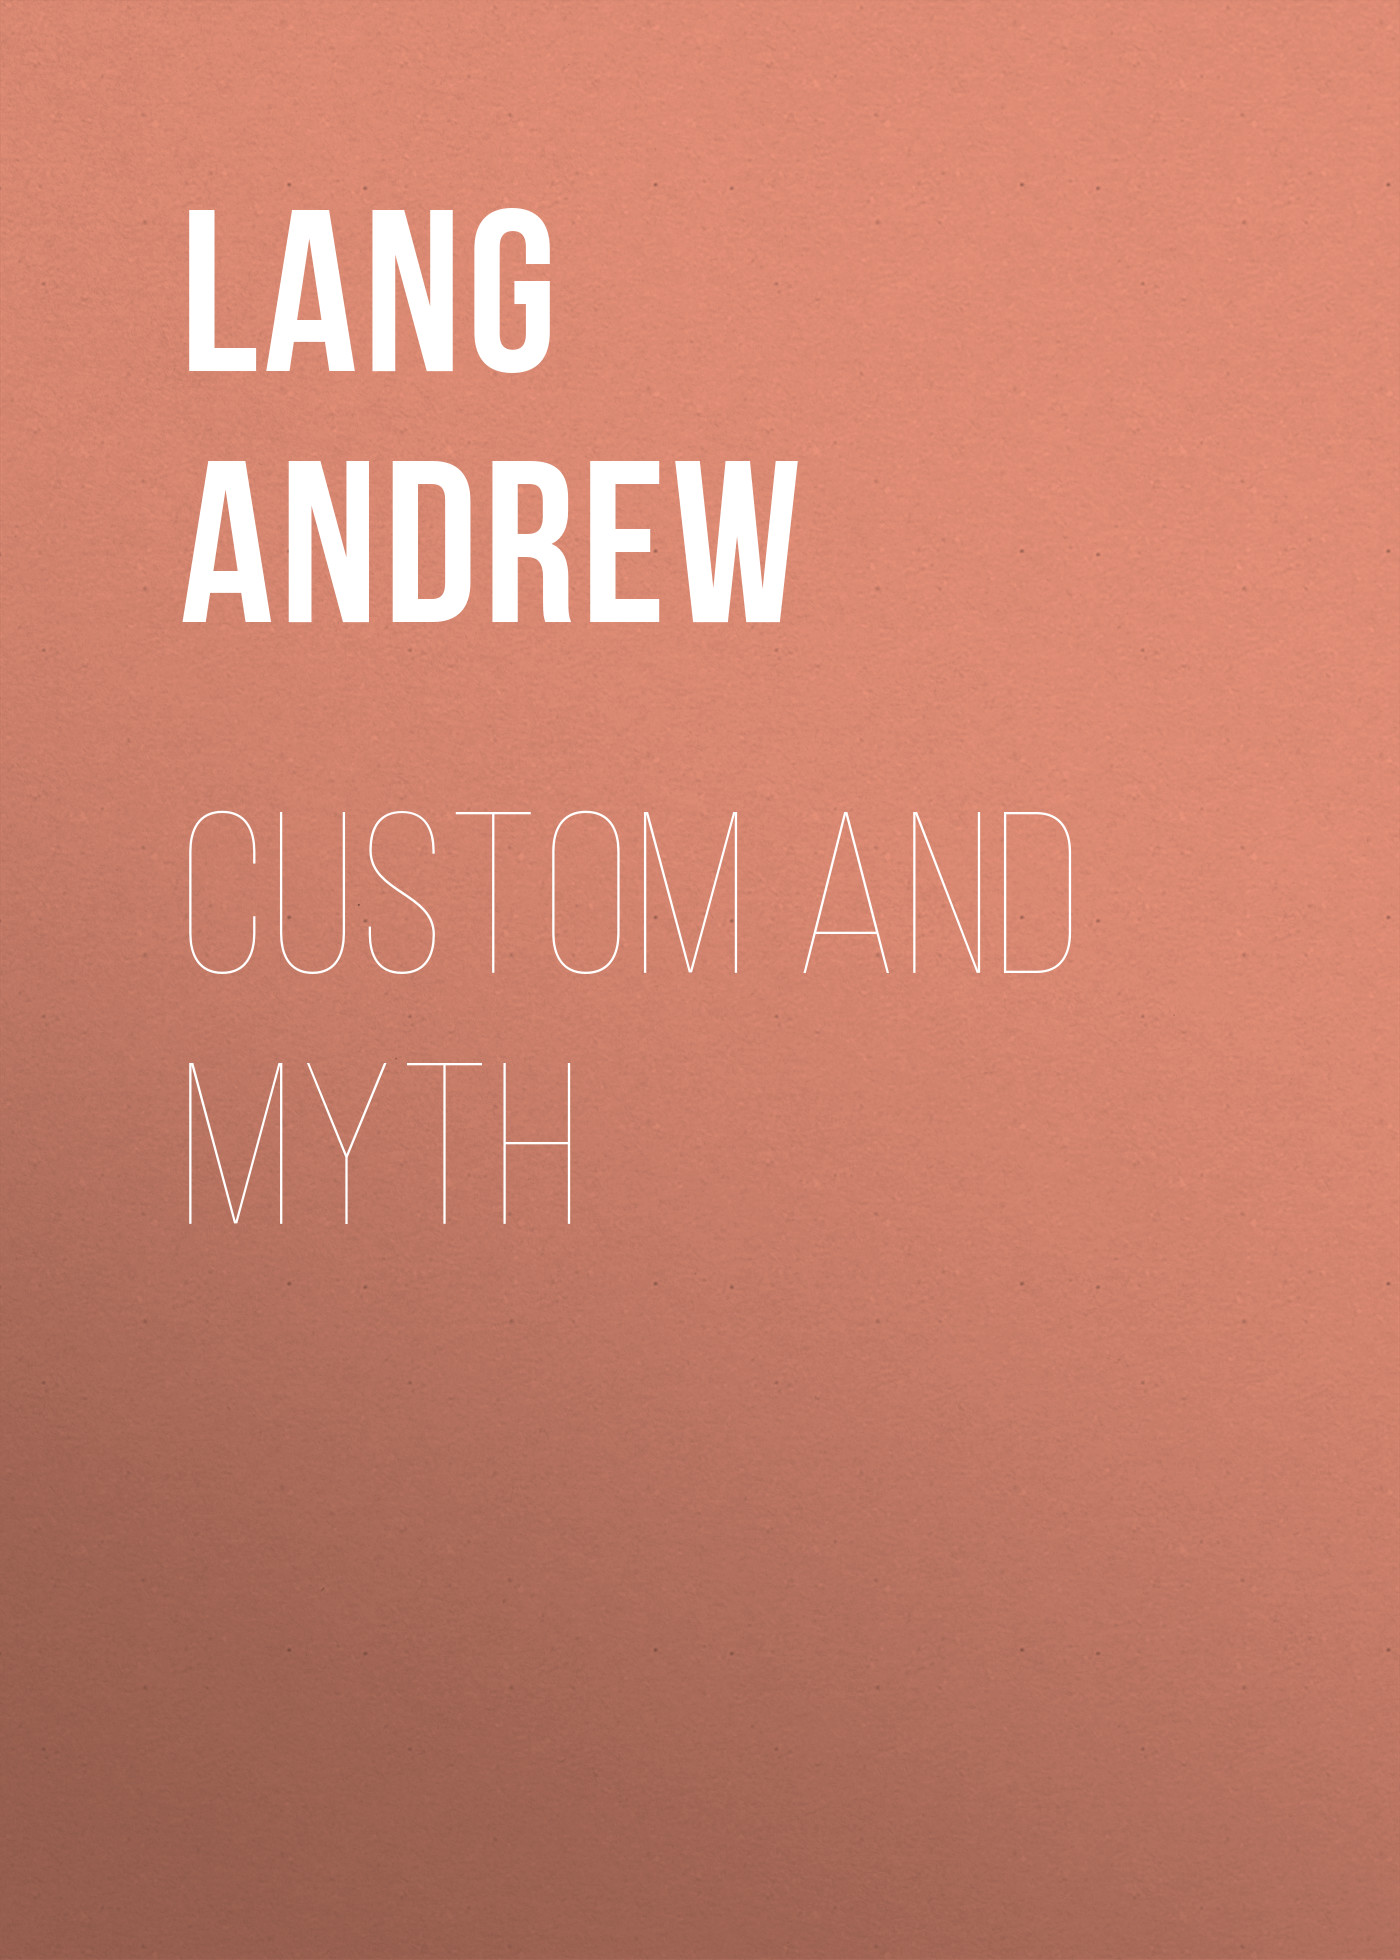 Lang Andrew Custom and Myth cmt in stock bandai tamashii ex virgo shaka cloth myth restock ver action figure cloth myth metal armor